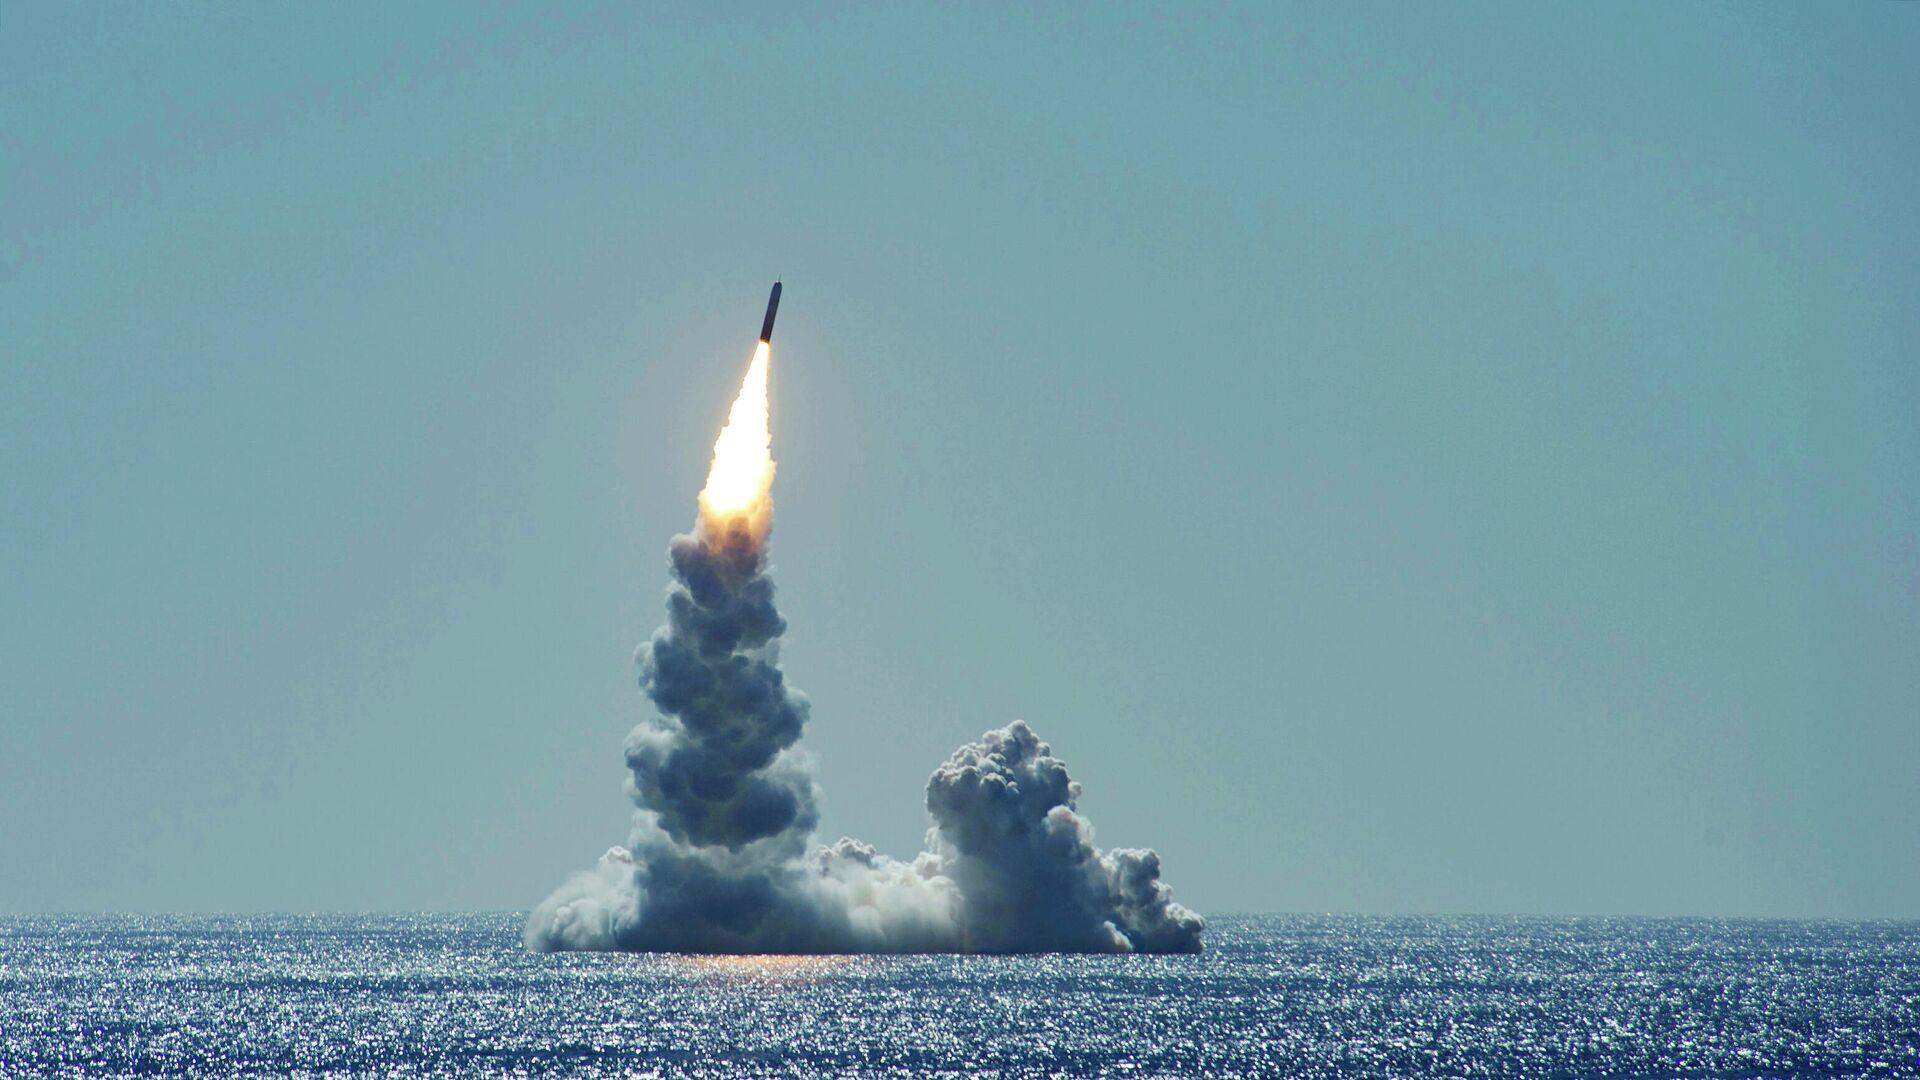 Запуск баллистической ракеты Trident II (D5LE) с подводной лодки USS Maine - РИА Новости, 1920, 12.09.2020